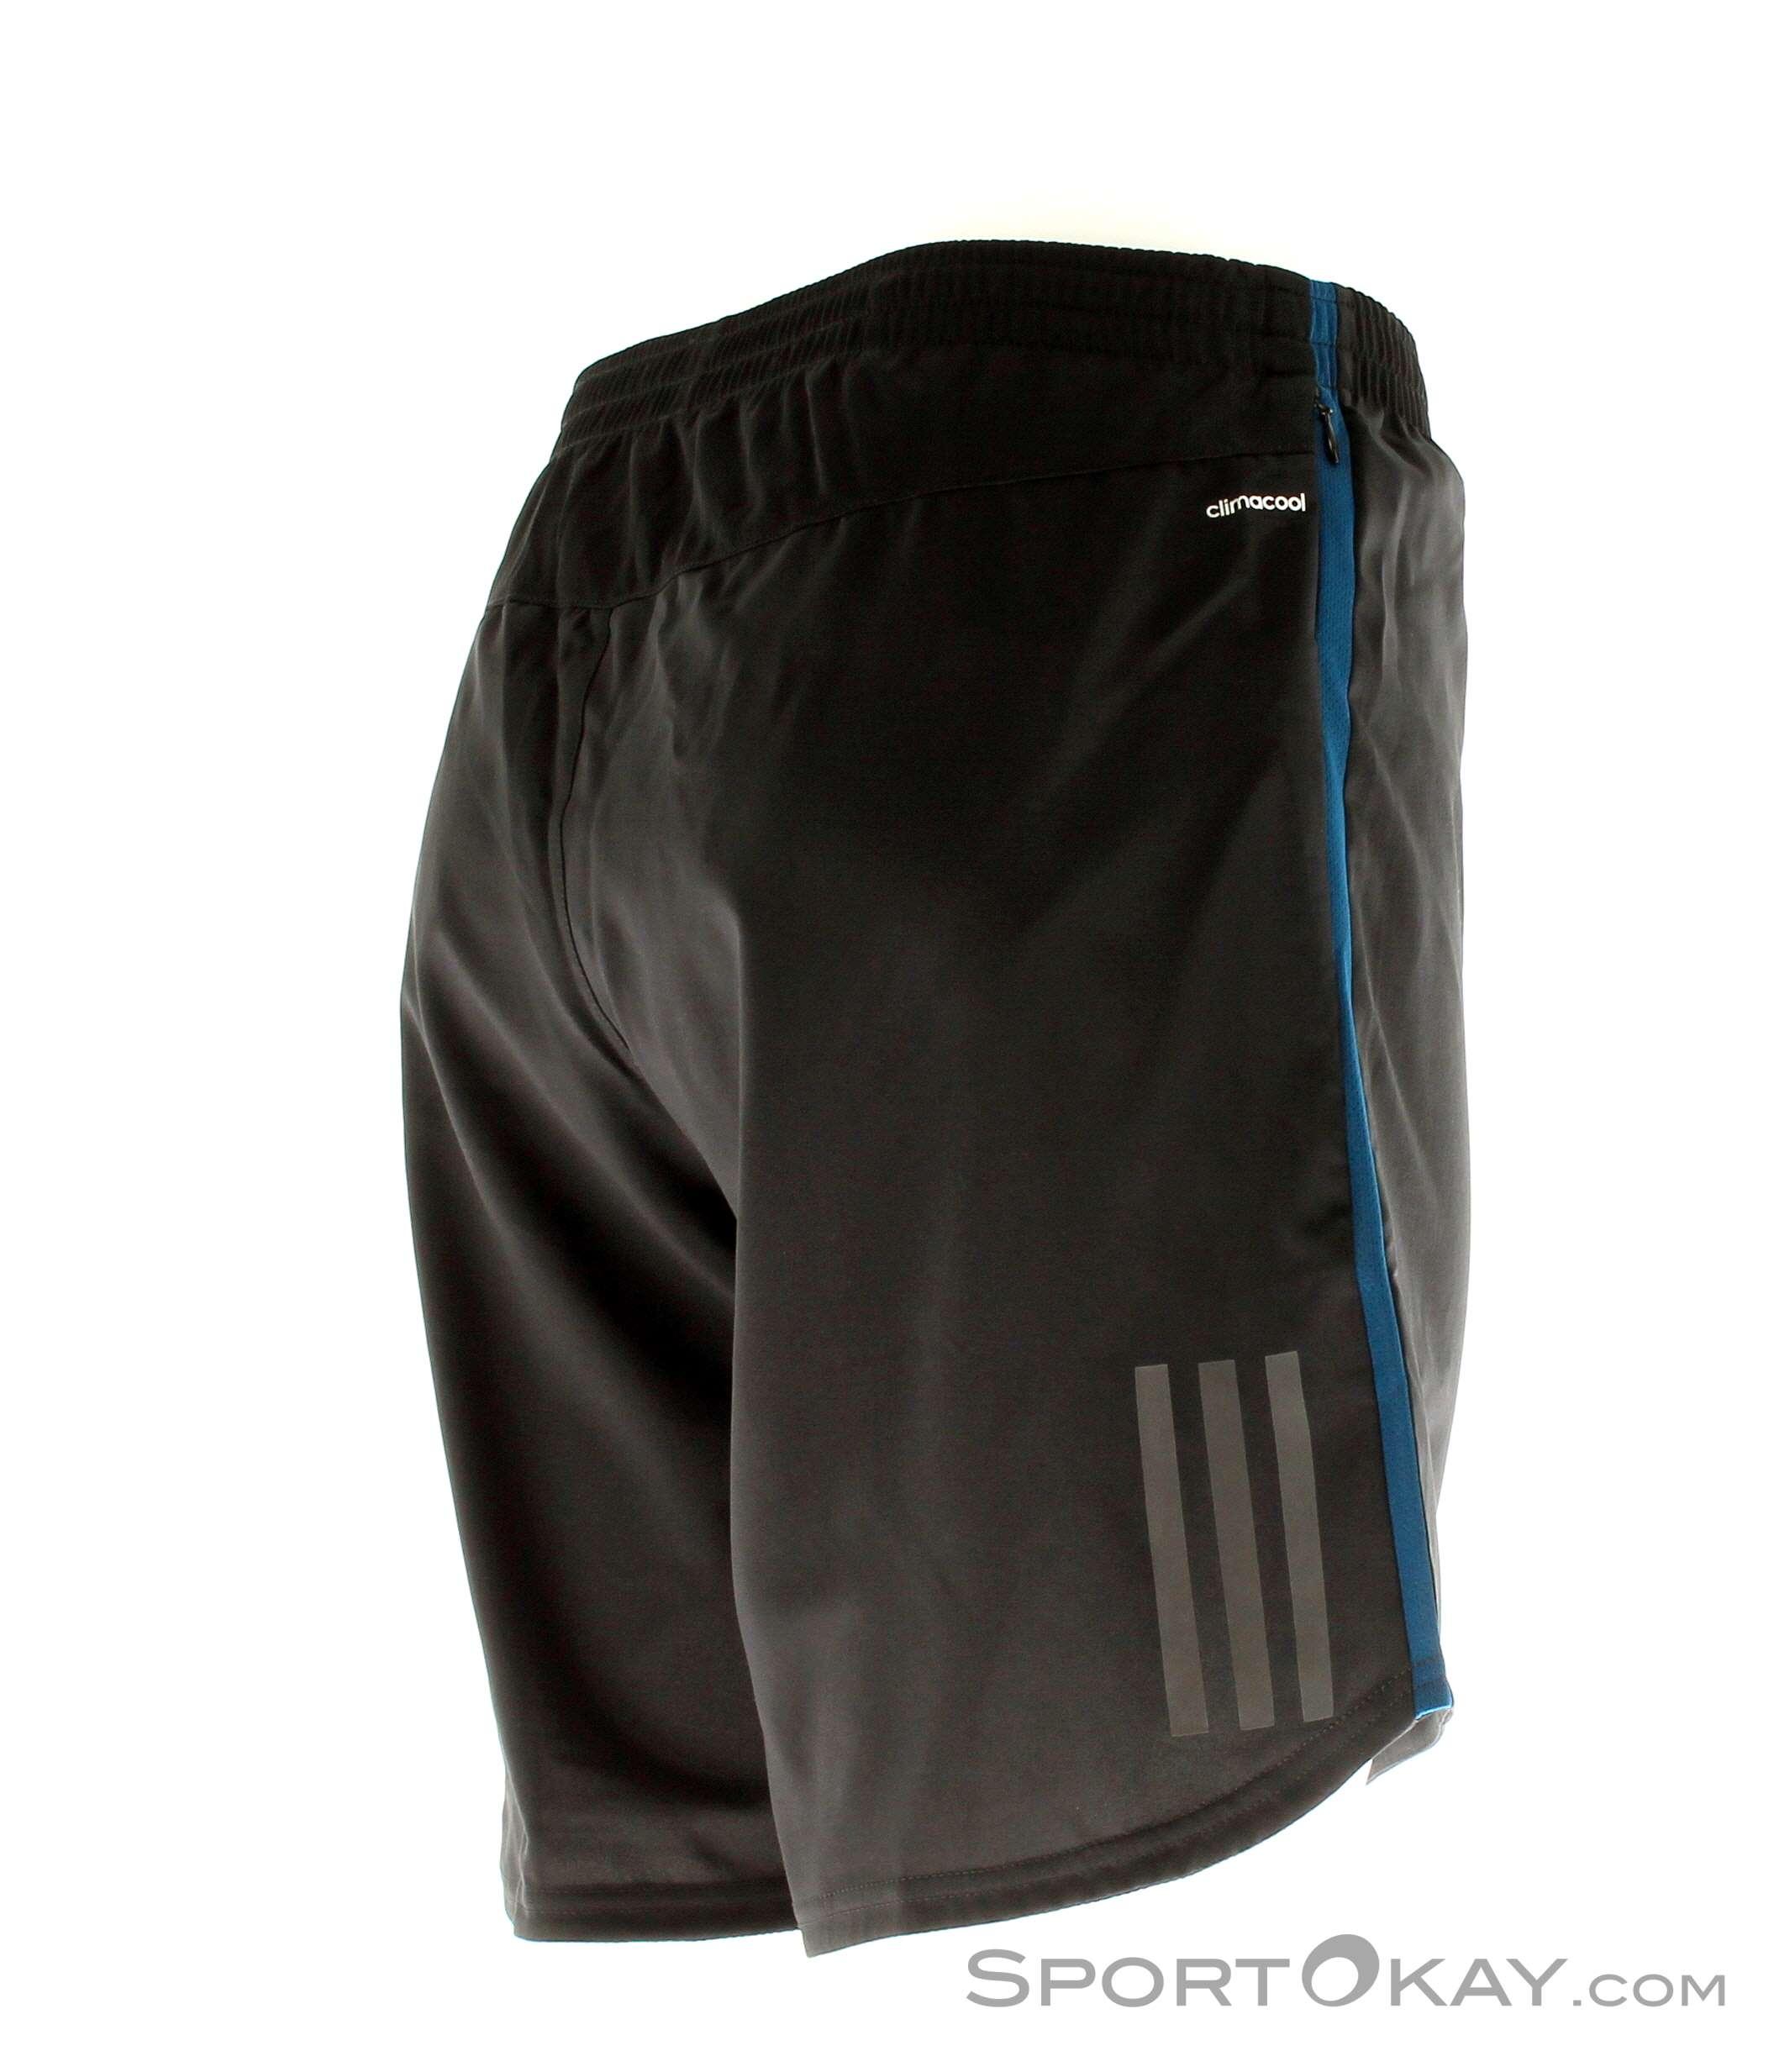 adidas adidas RS Shorts Herren Laufhose